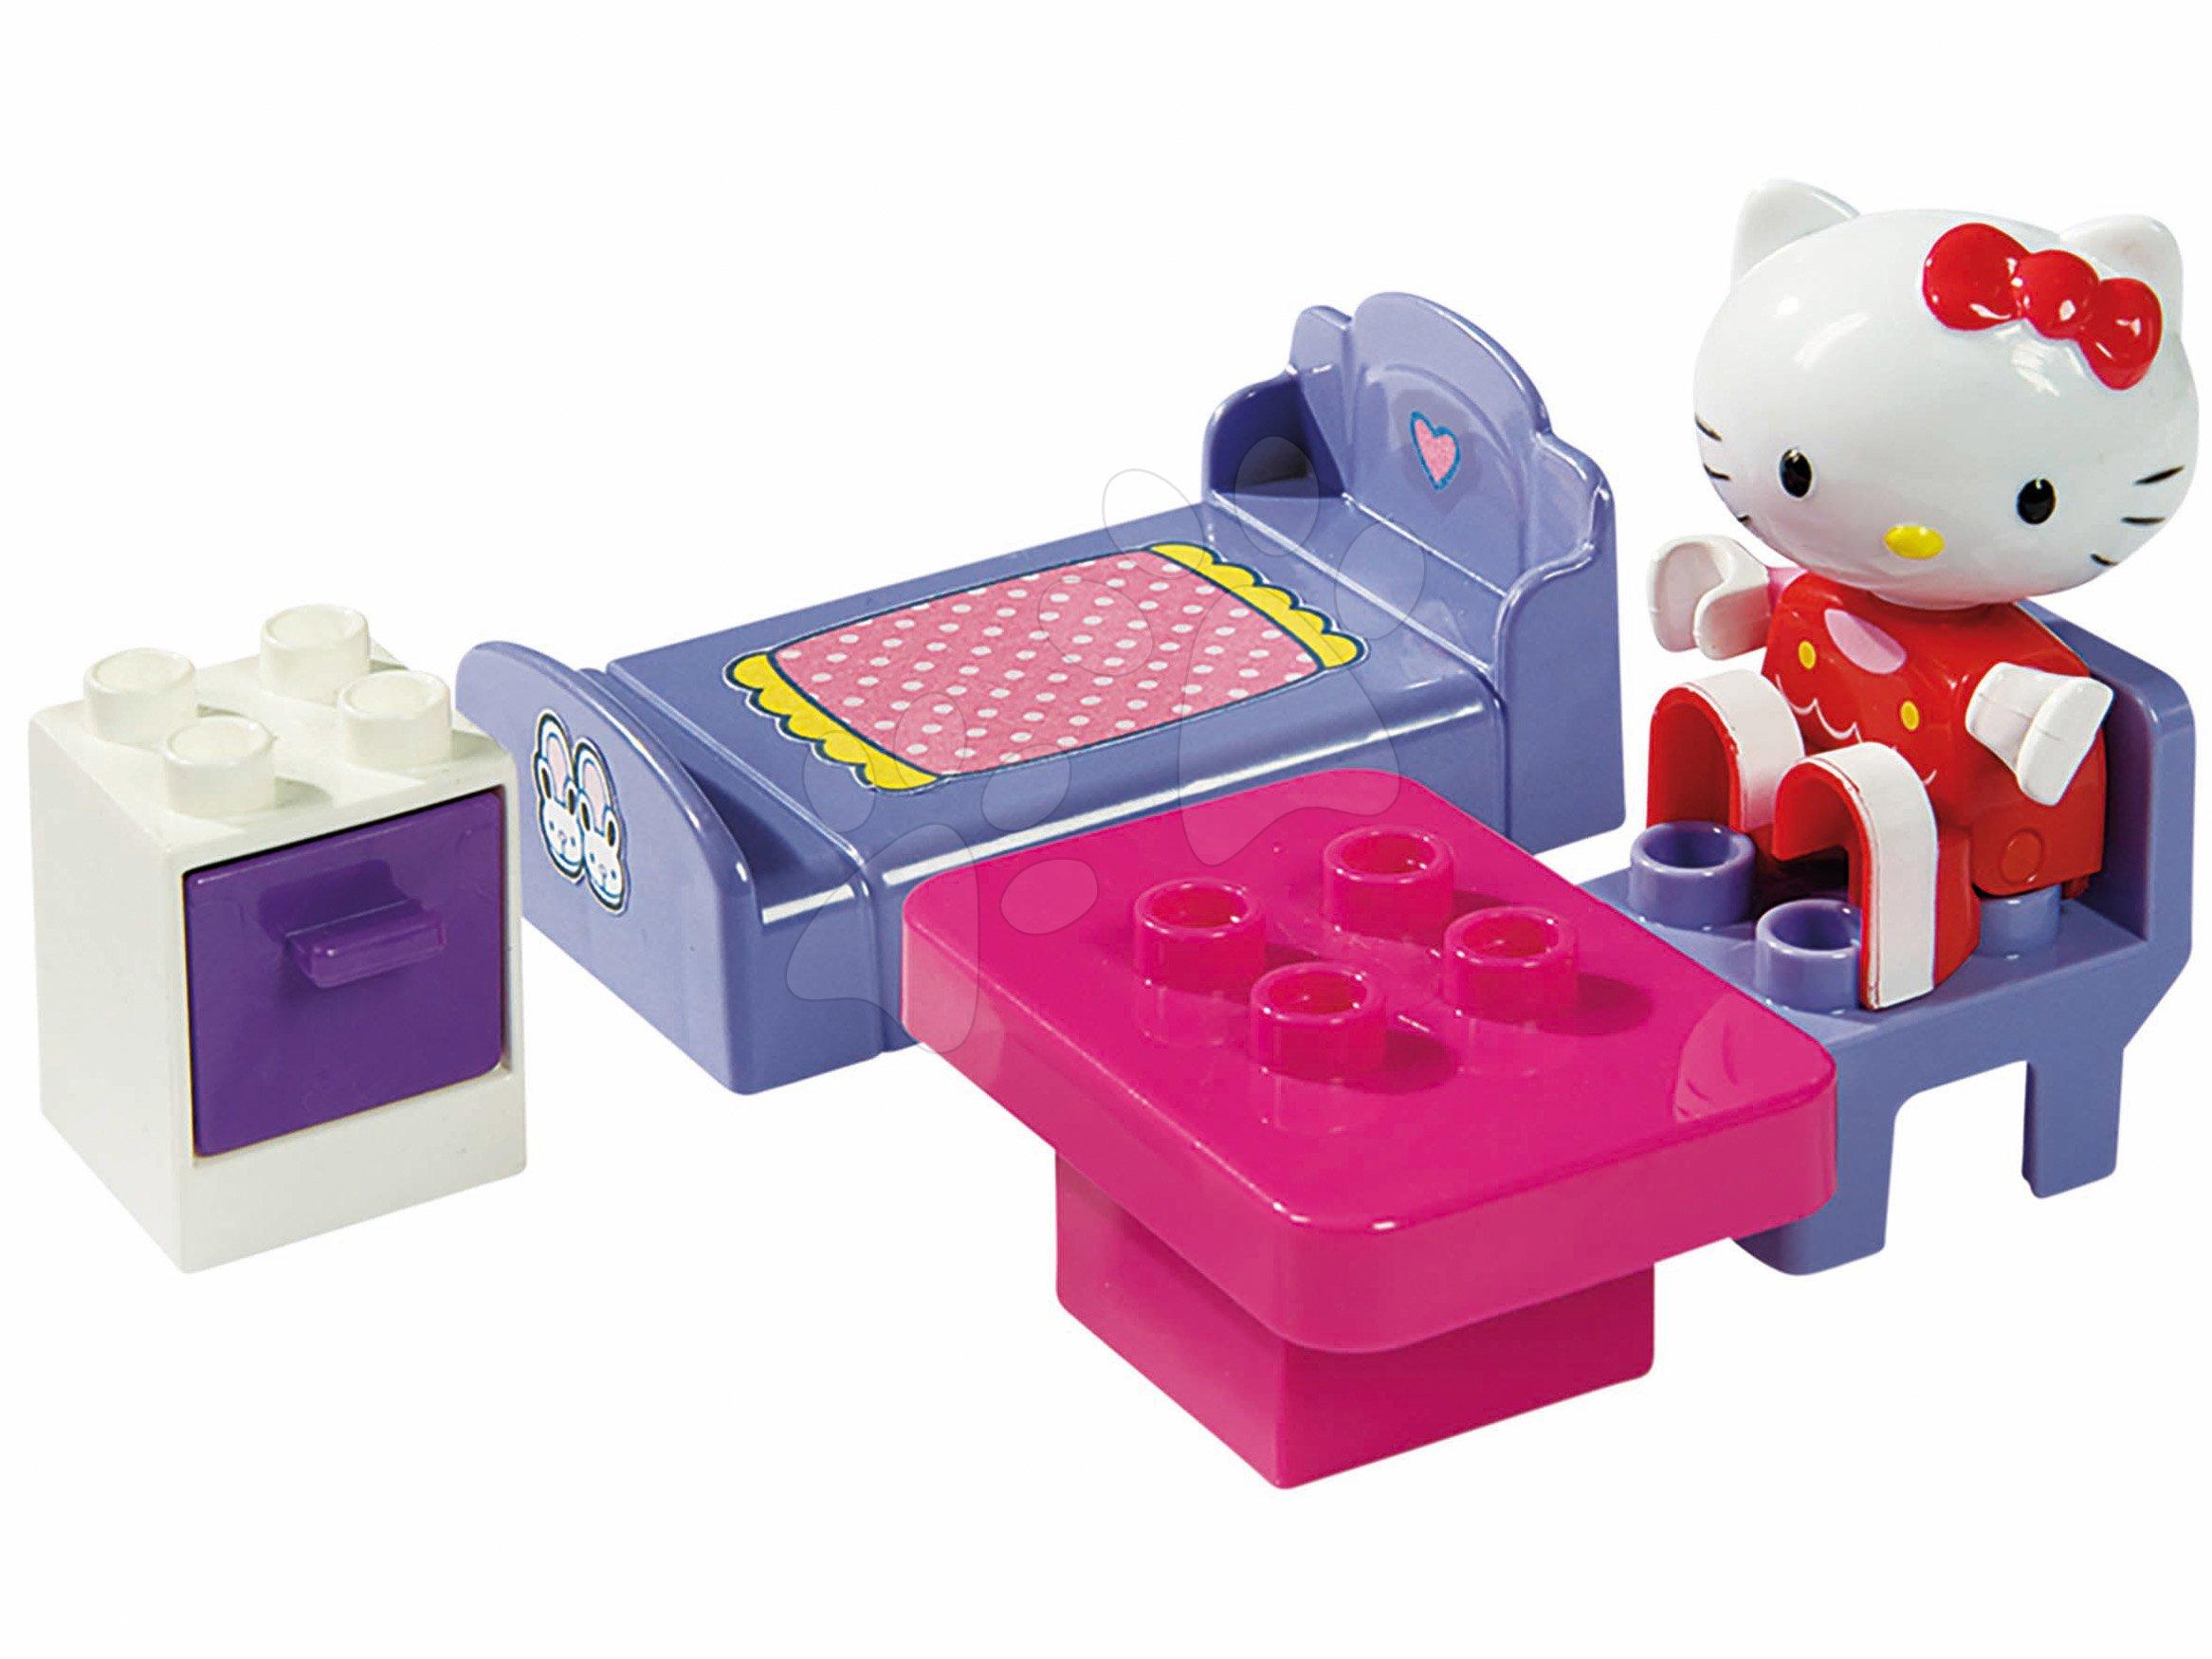 Stavebnica PlayBIG Bloxx Starter Box BIG Hello Kitty v spálni na stoličke od 18 mes